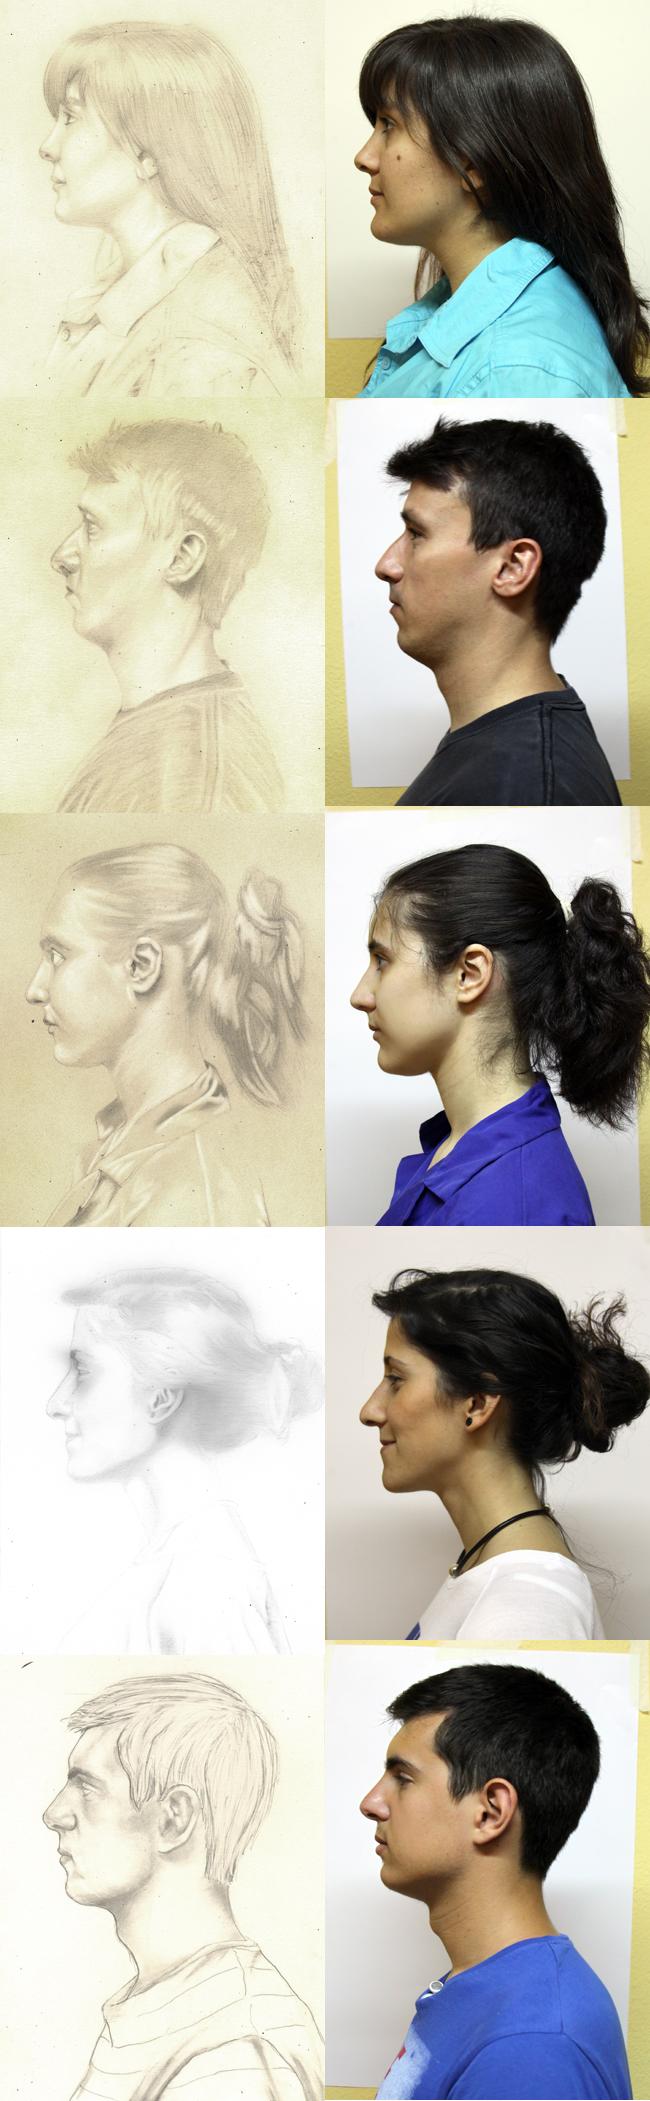 retratos-dibujo-alumnos-cursos-academia-c10-lapiz-bocetos